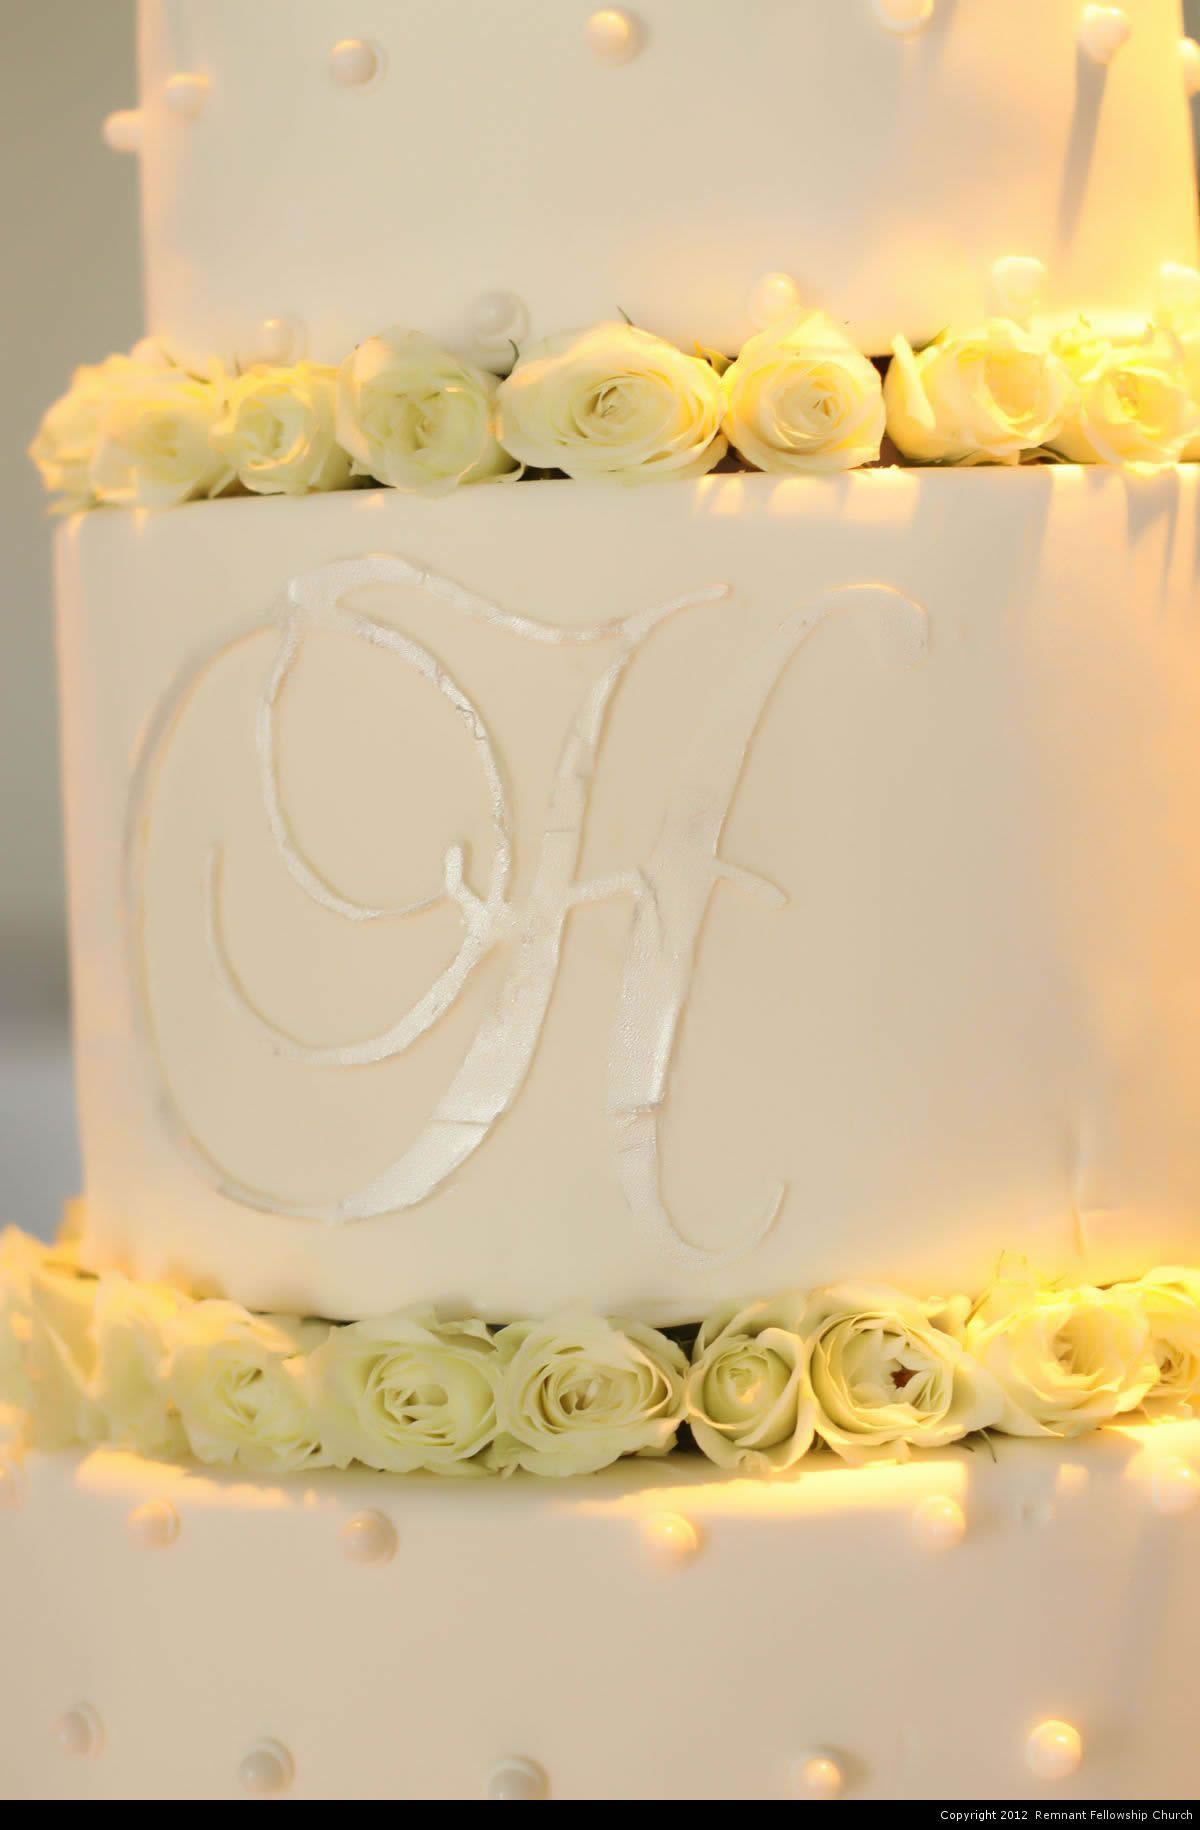 Homonnay Wedding - Wedding Cake